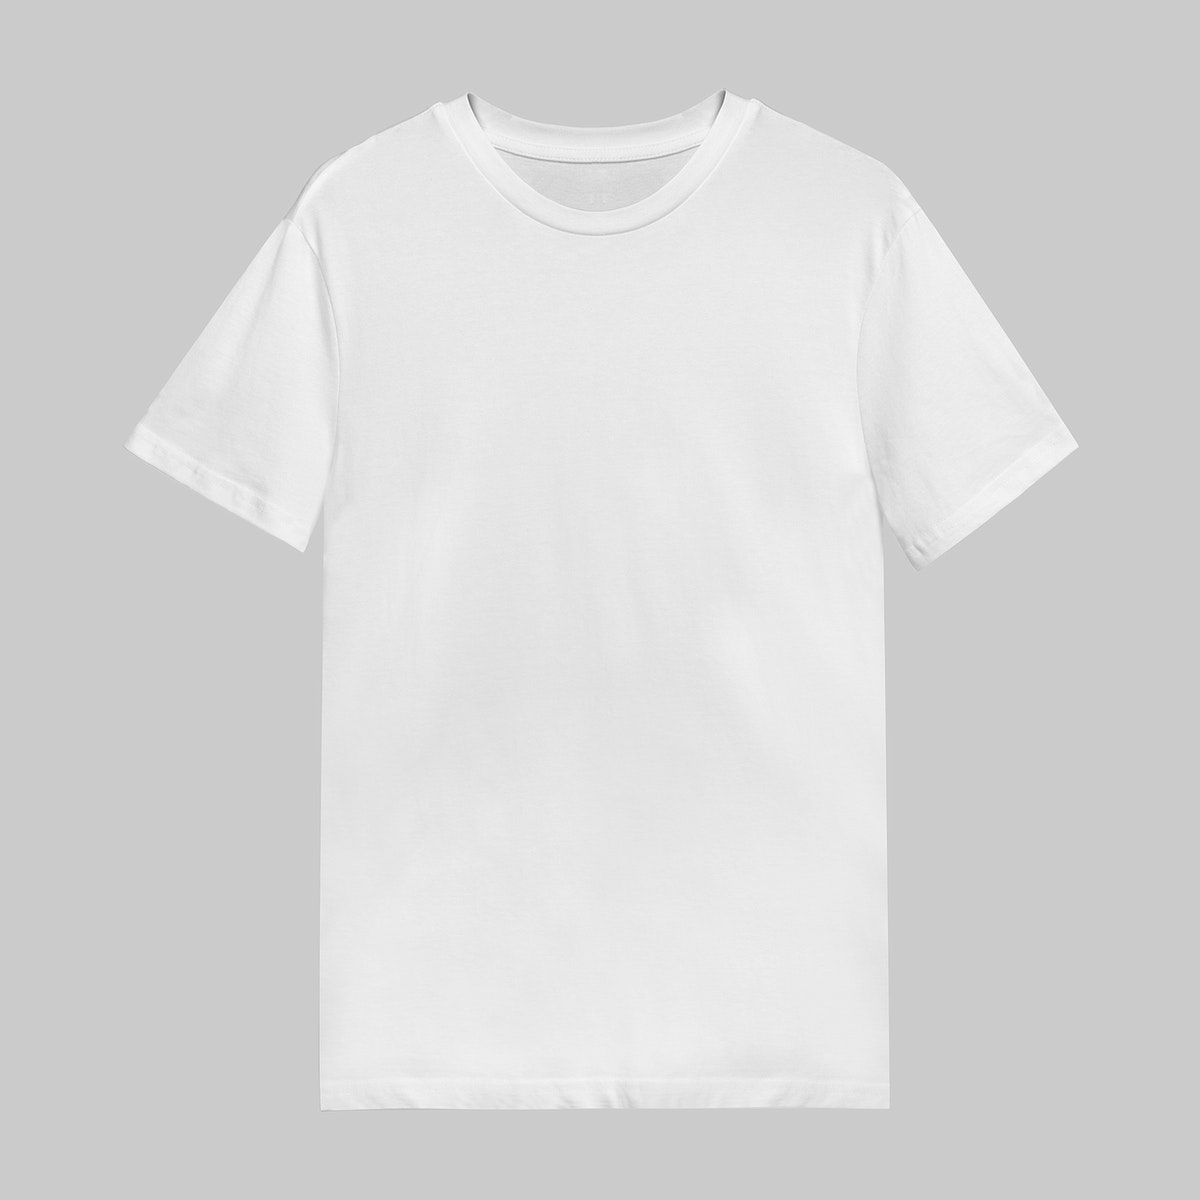 Download Download Premium Illustration Of White T Shirt Mockup On Gray Background Shirt Mockup Tshirt Mockup Tshirt Mockup Free